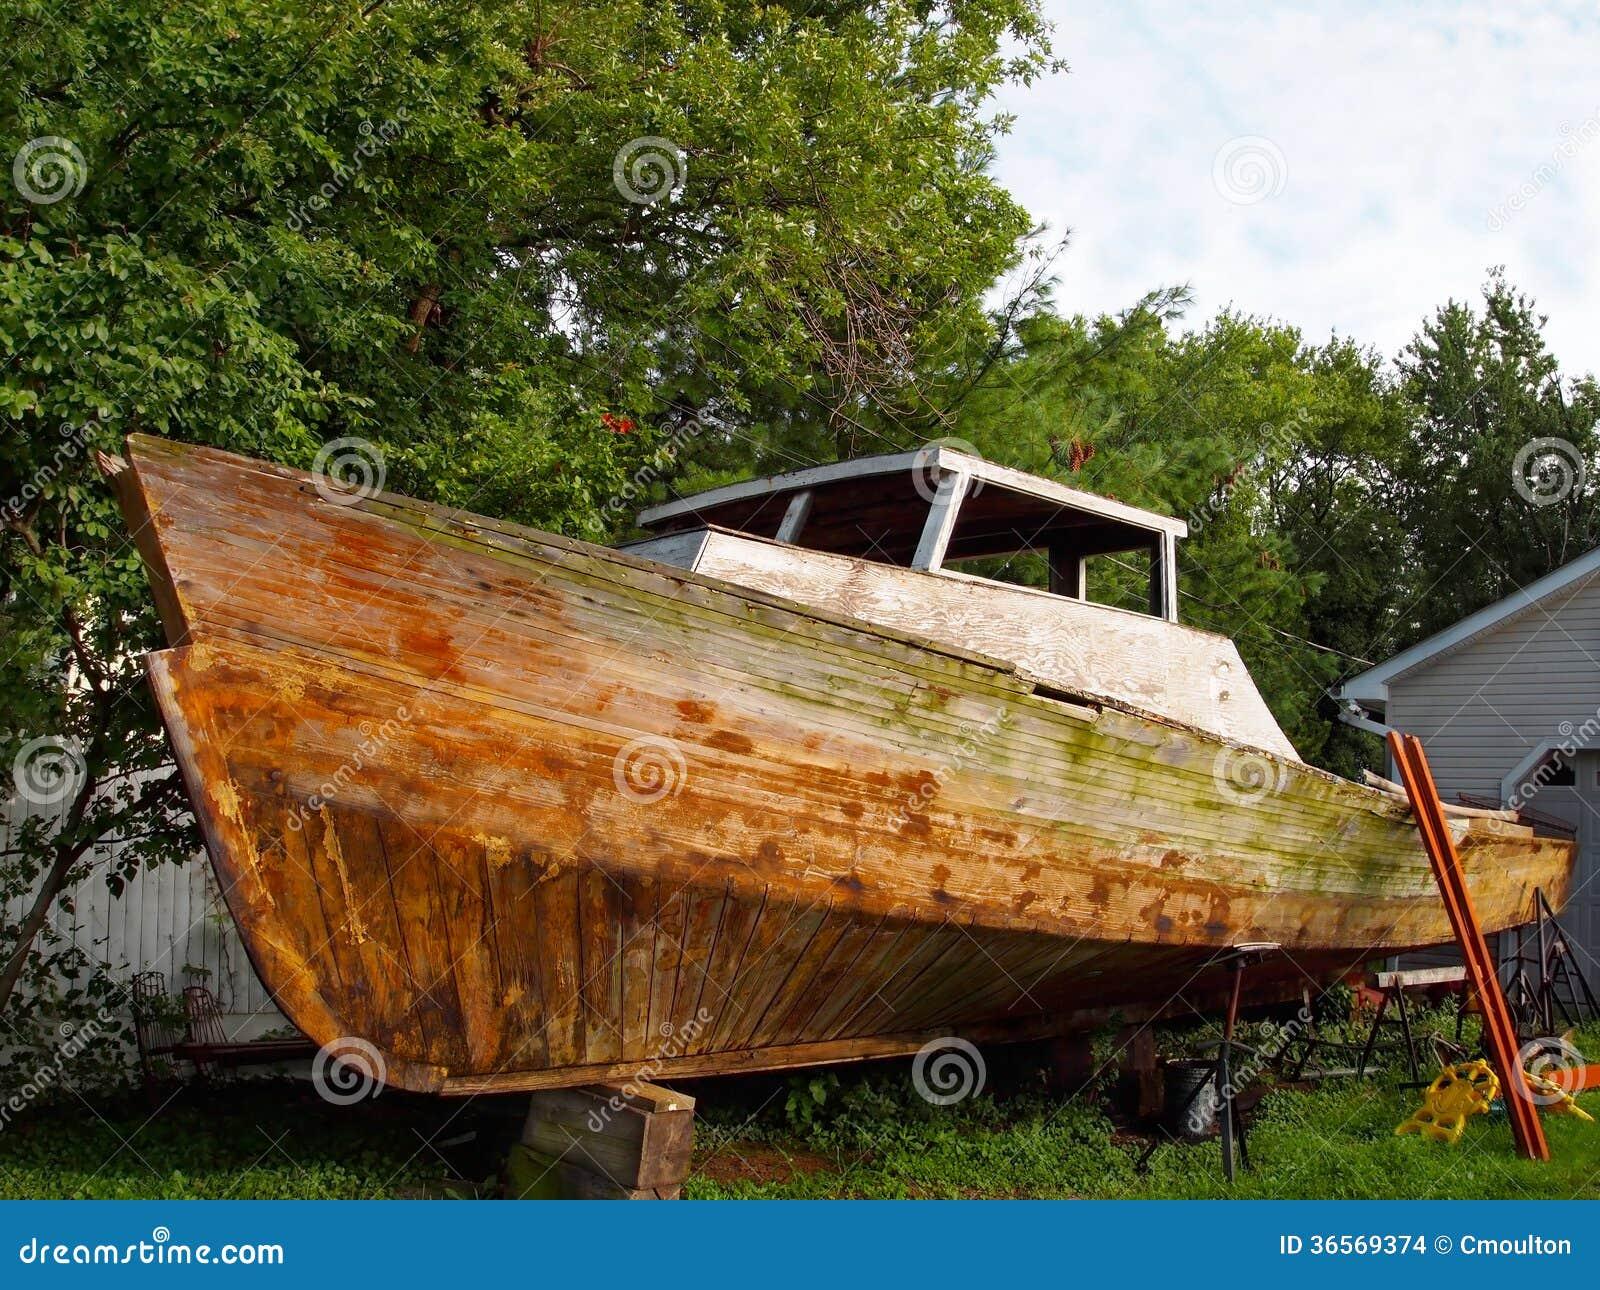 Old Boat Repair Stock Images - Image: 36569374